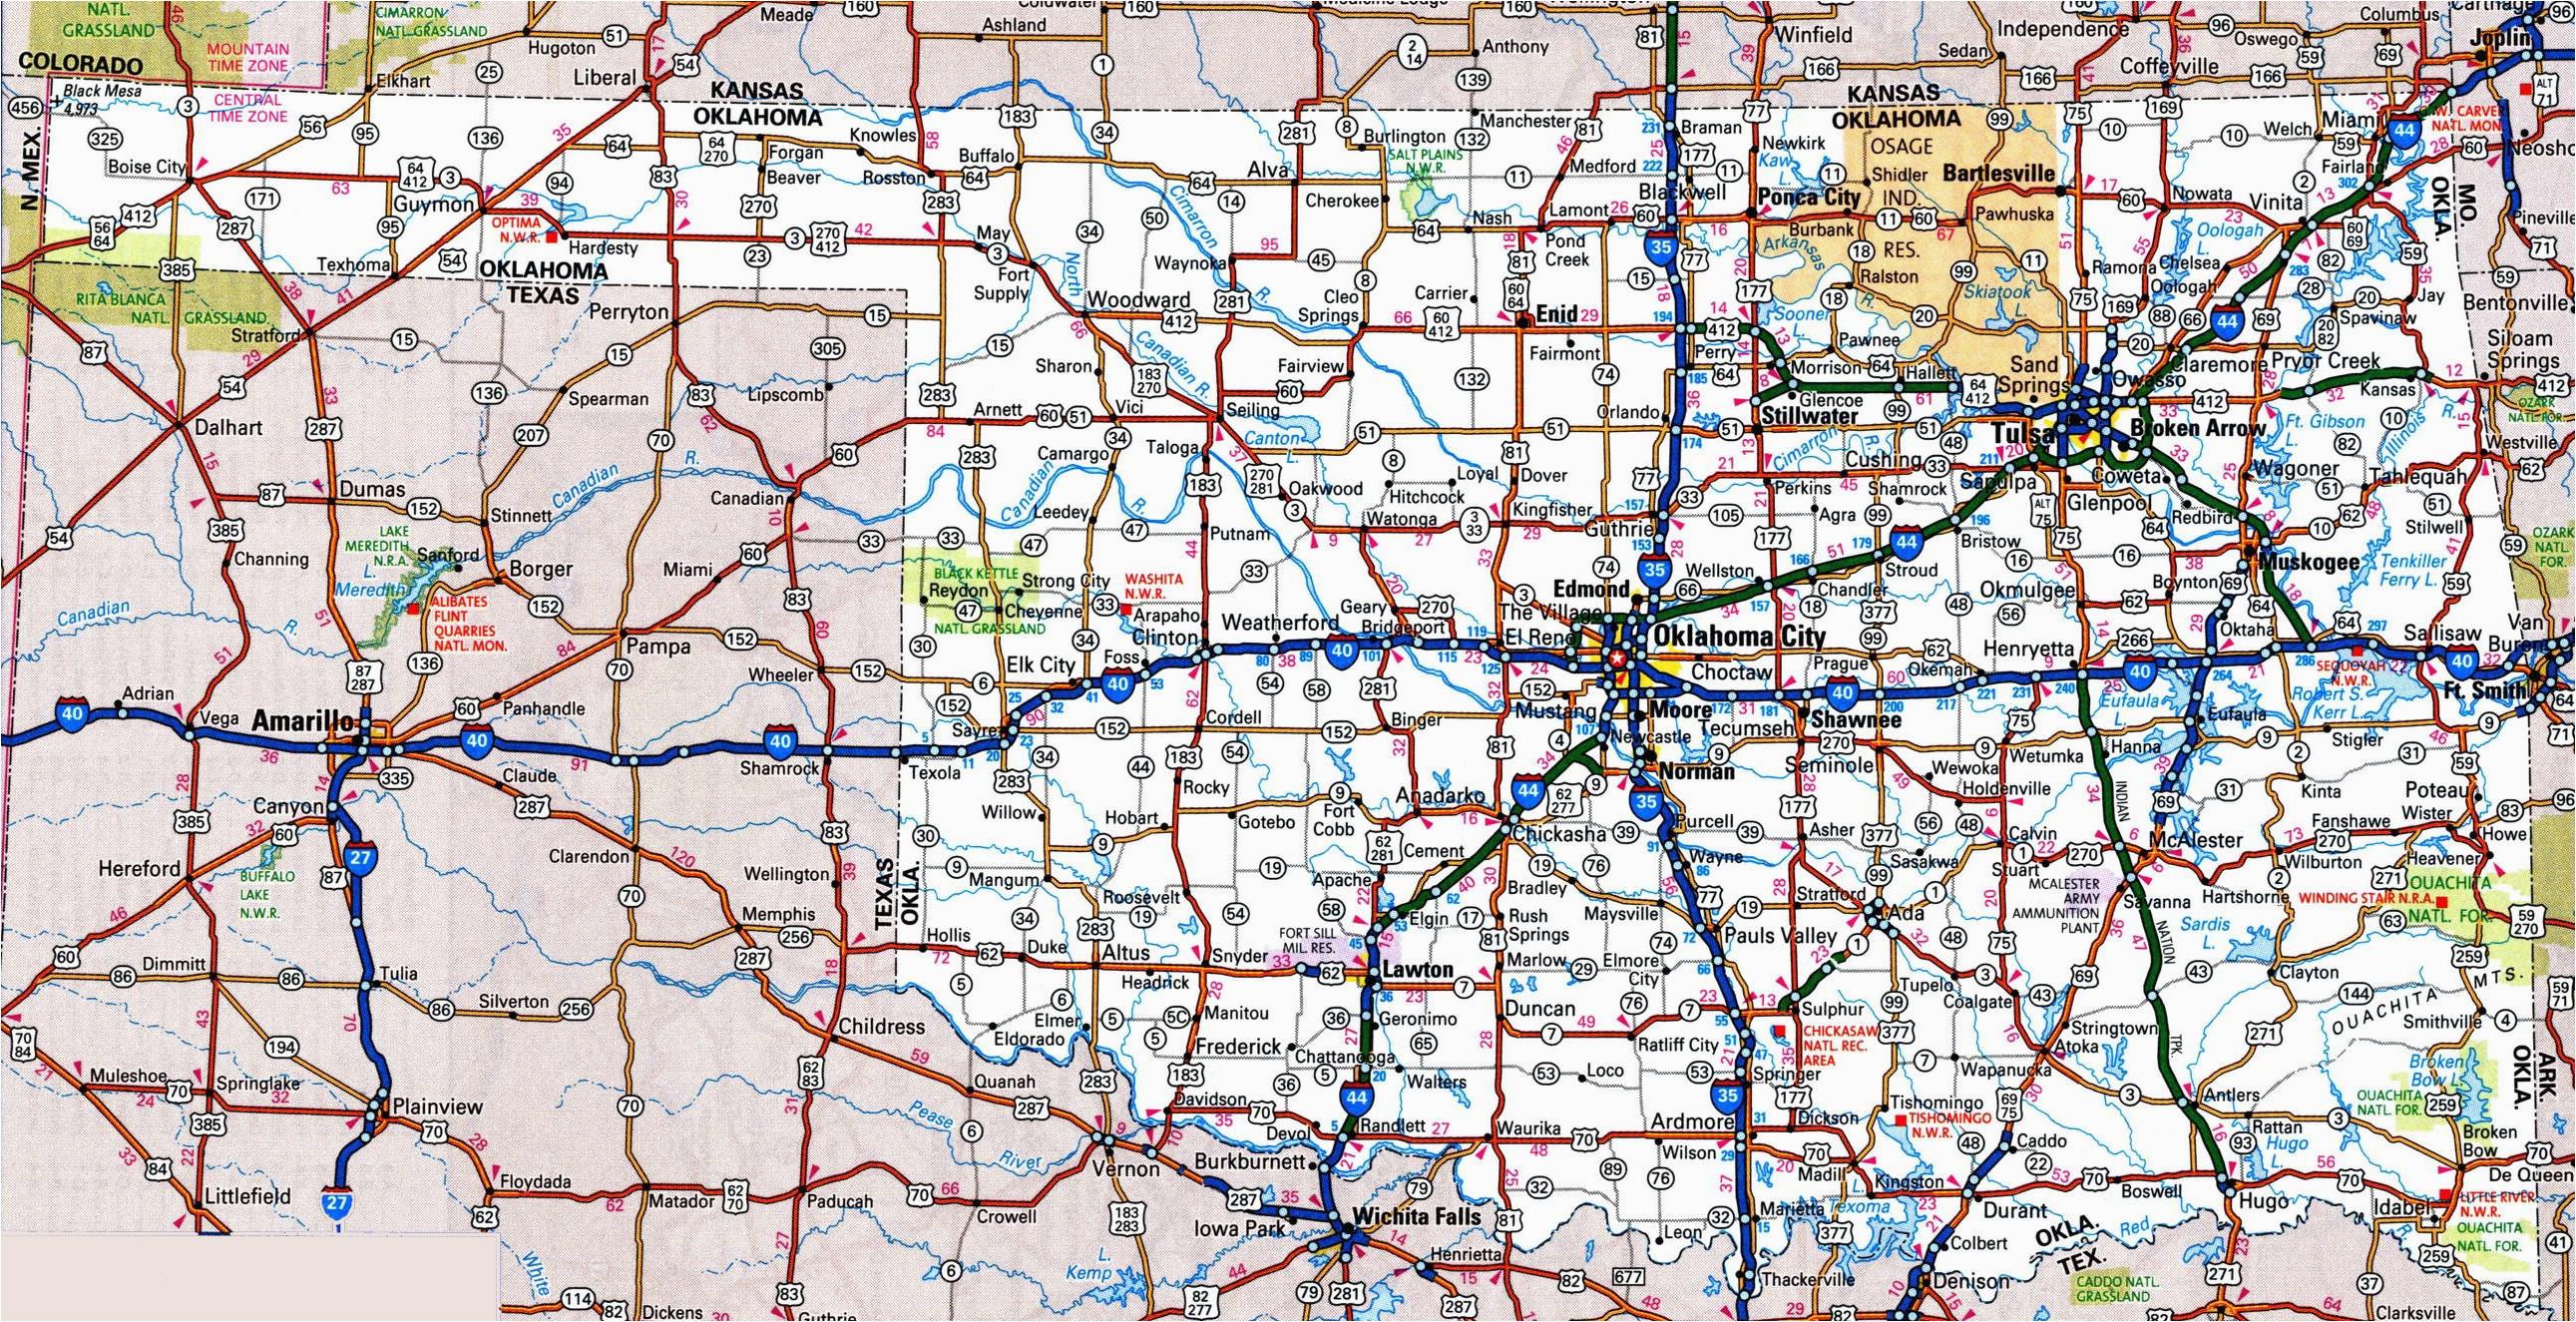 Texas Oklahoma Road Map Road Map Of Oklahoma And Texas